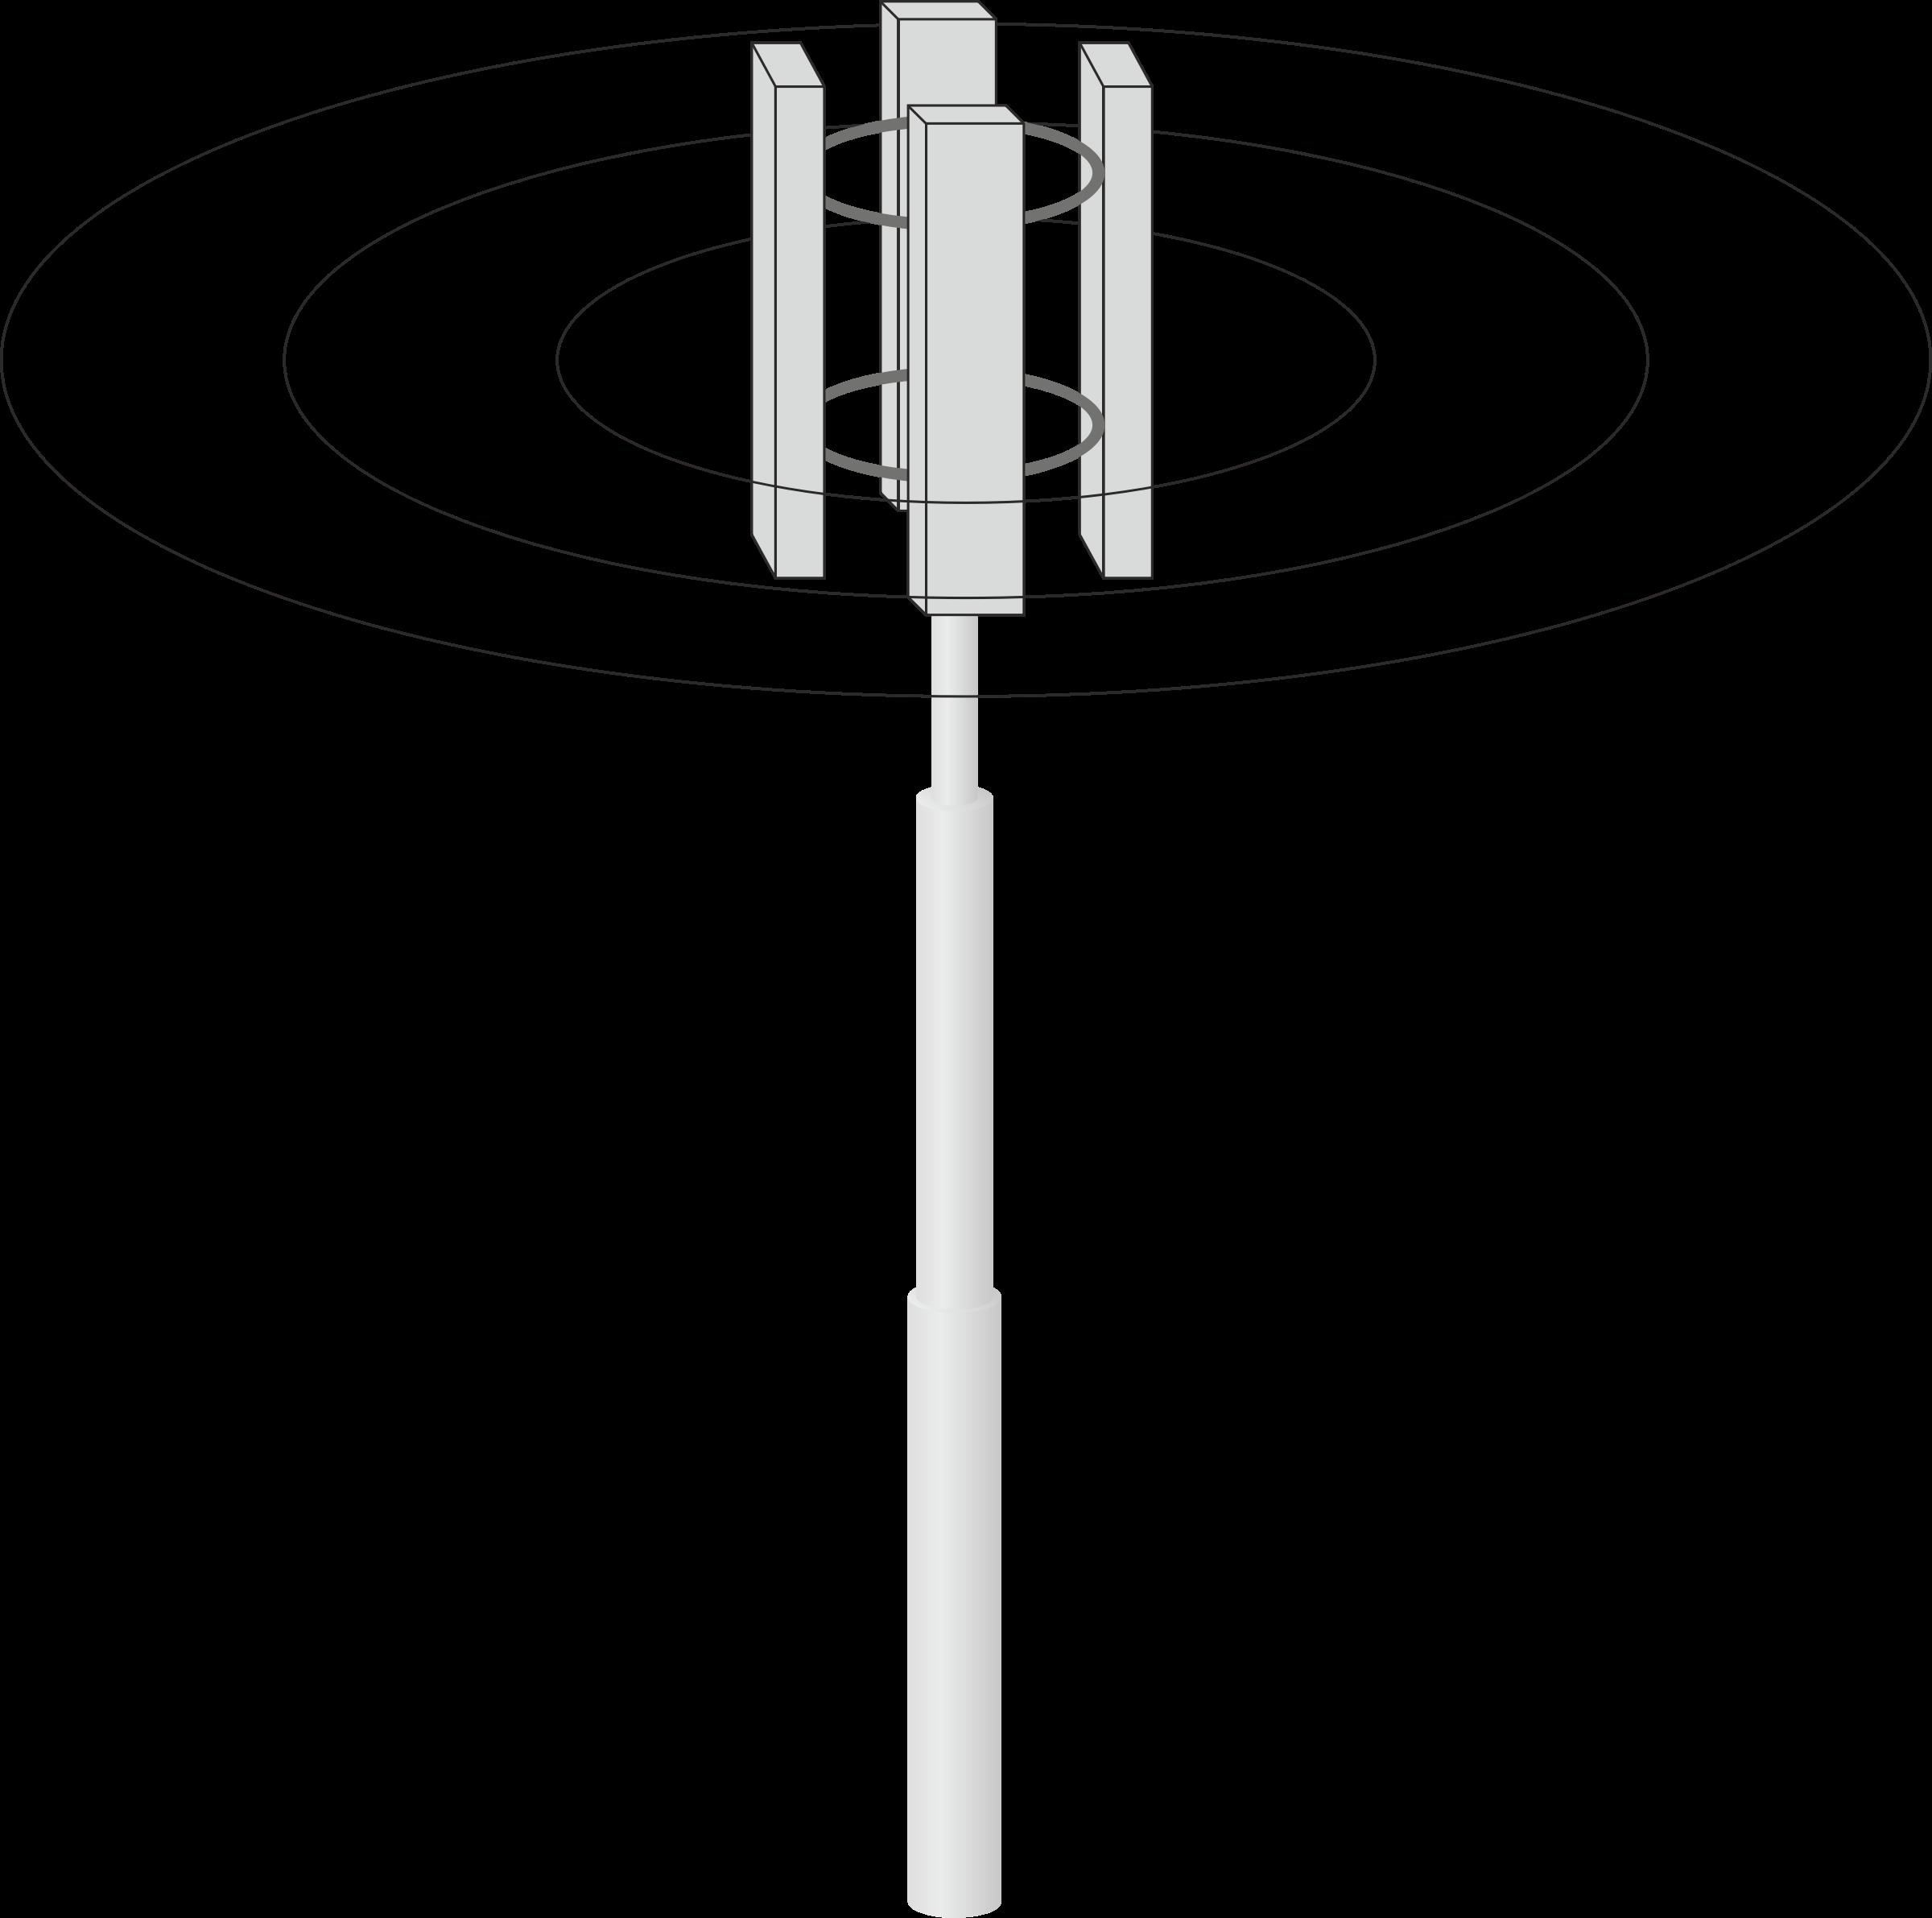 Mast big image png. Communication clipart radio communication